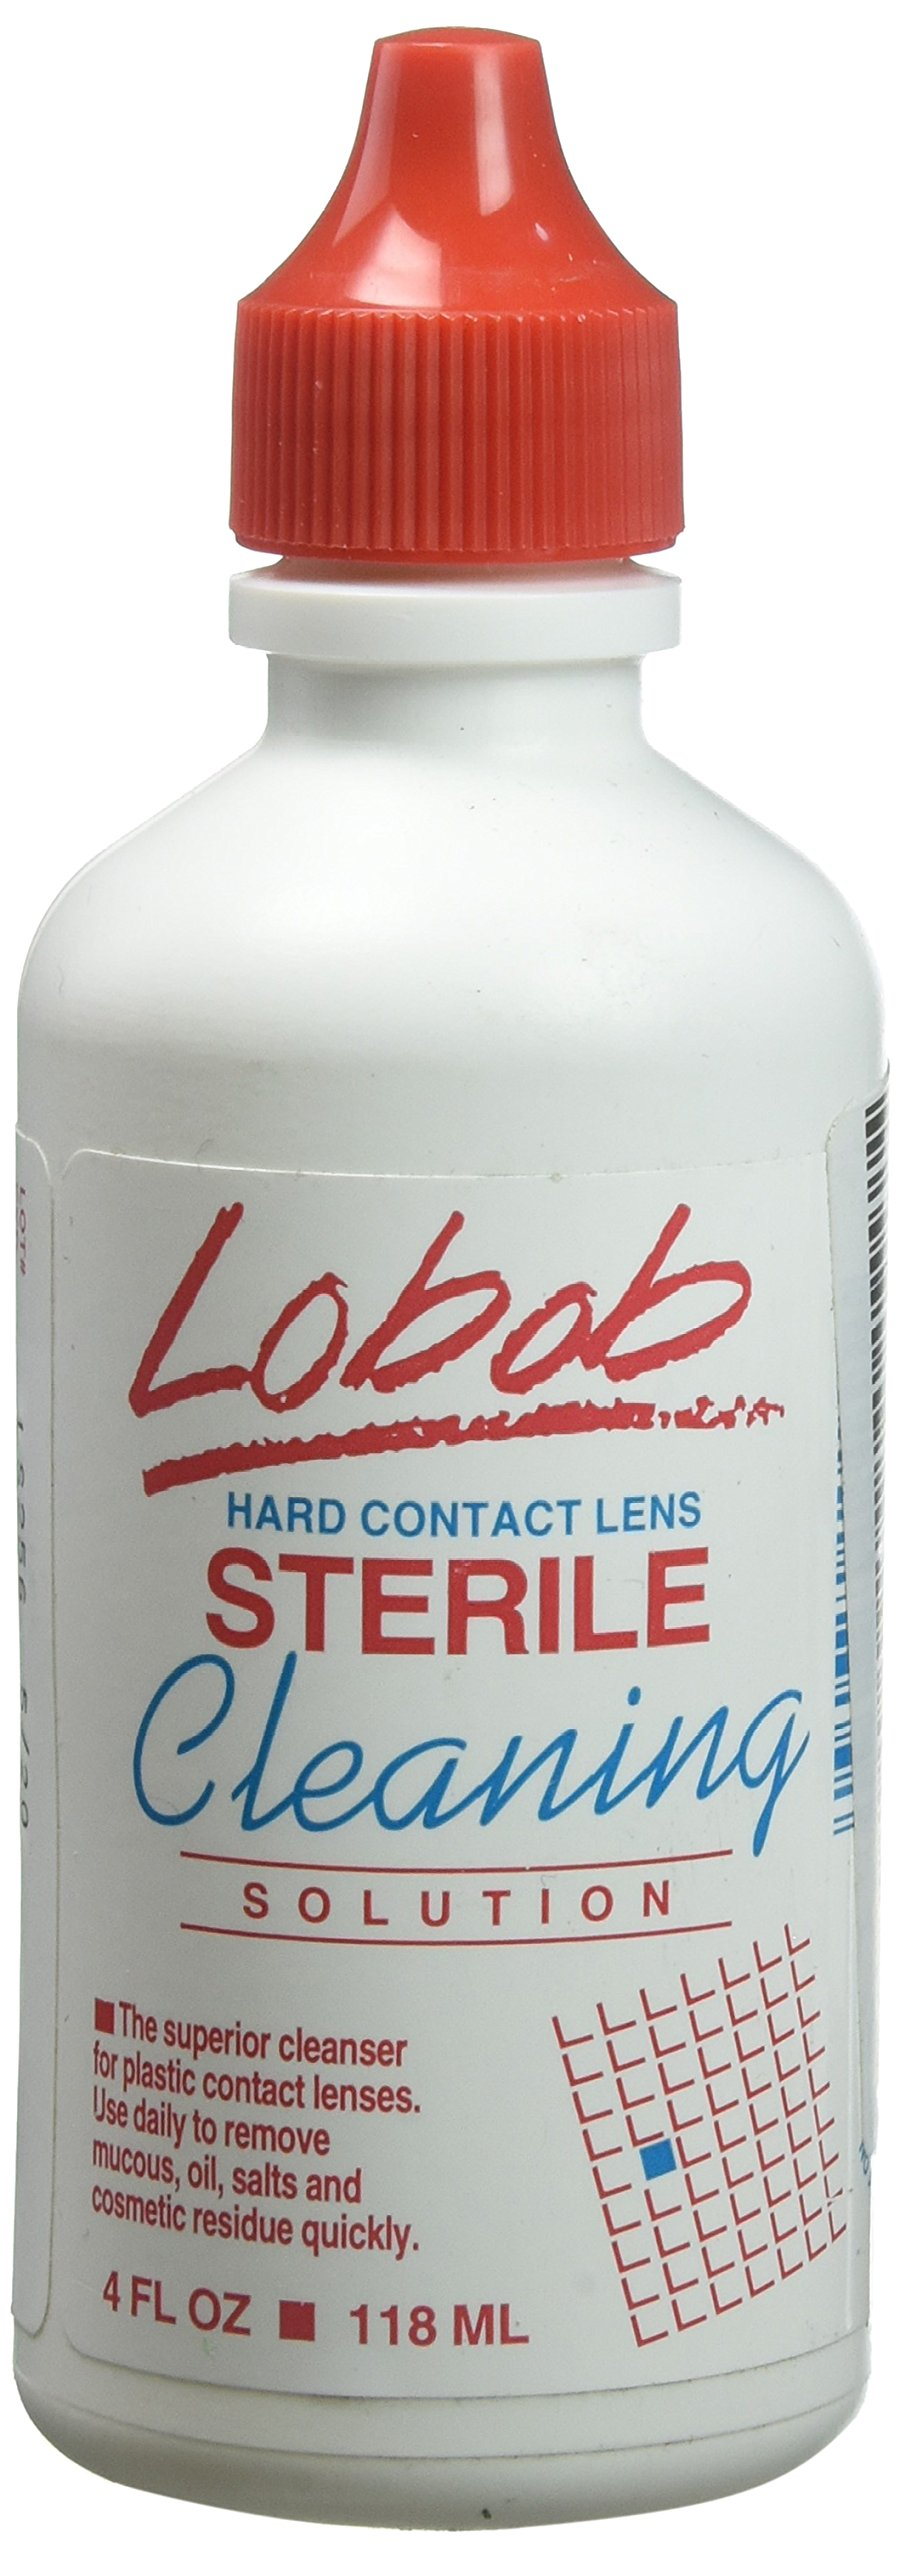 Lobob - Sterile Cleaning Solution for Hard Lenses, Non-Abrasive 4 Fl Oz